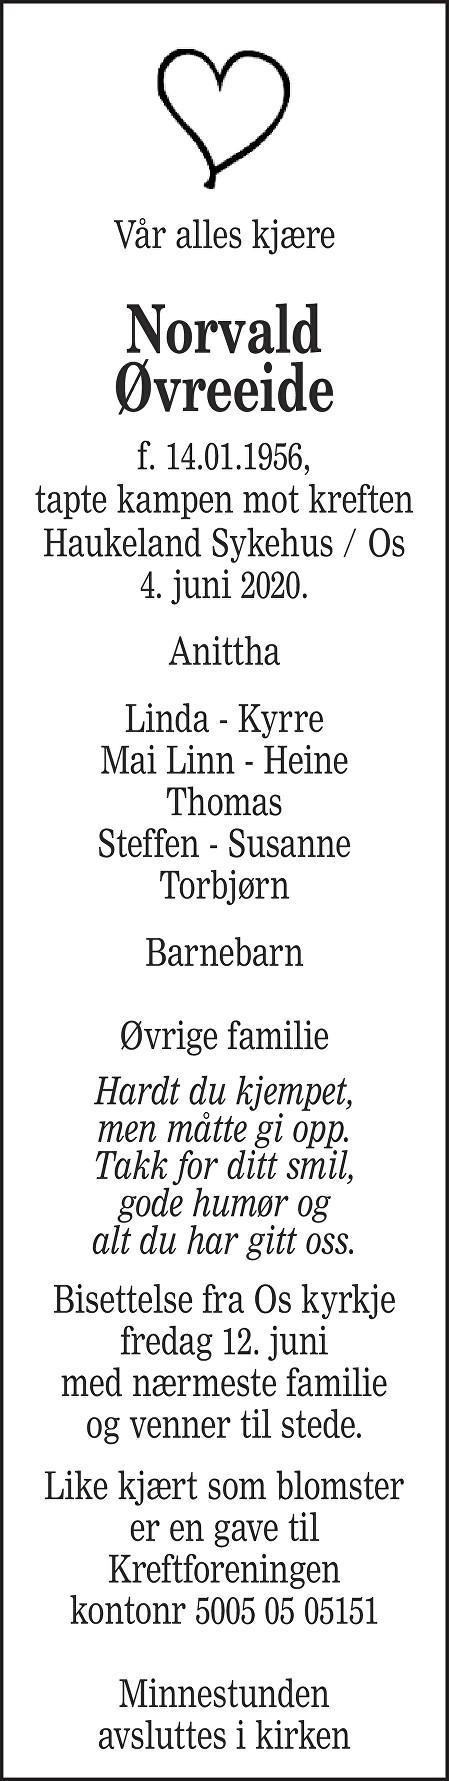 Norvald Øvreeide Dødsannonse